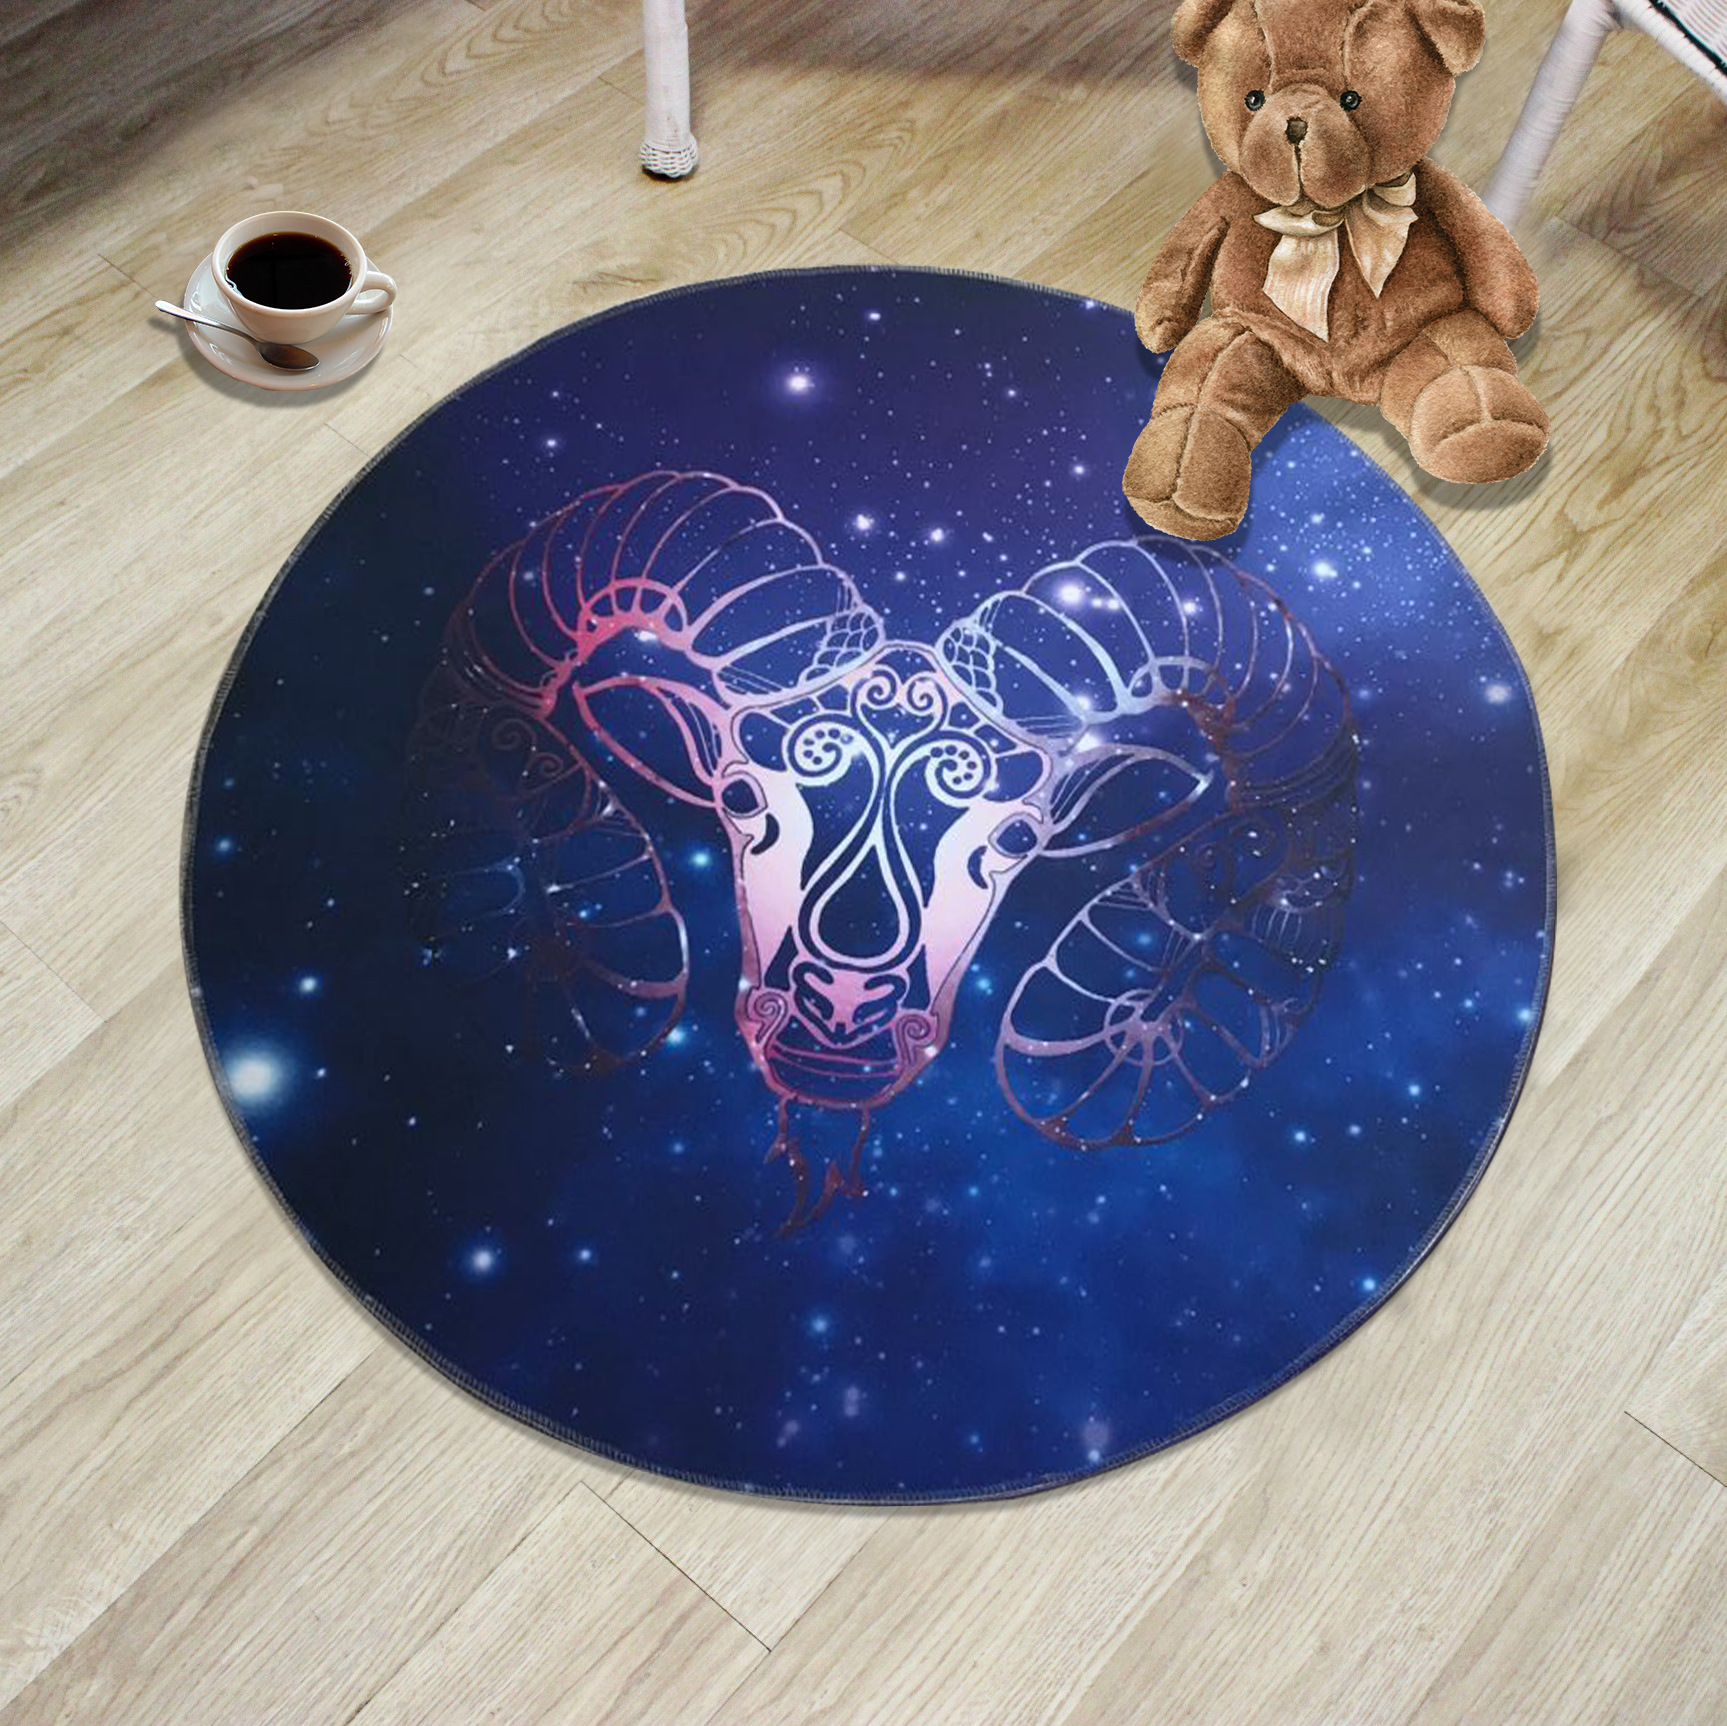 Creative 12 Constellation Round Carpets For living room bedroom Kids Cartoon computer chair Floor mat Modern Home Decor Carpet